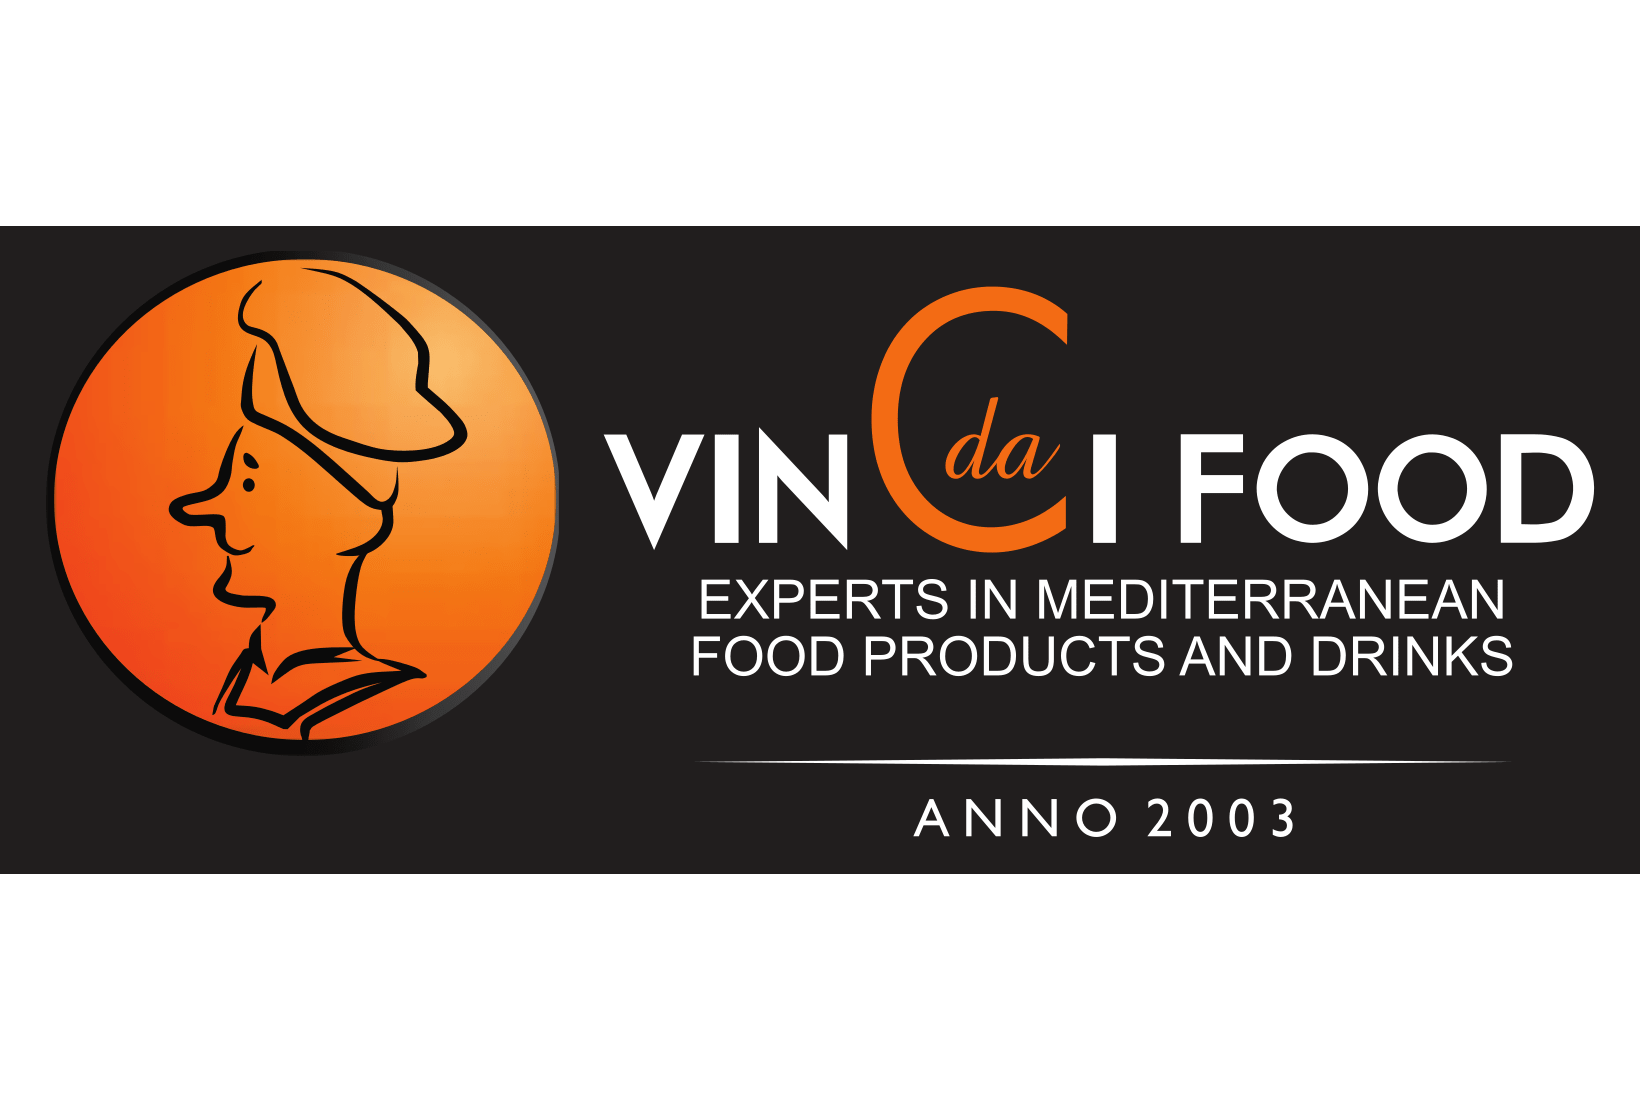 Da Vinci Food